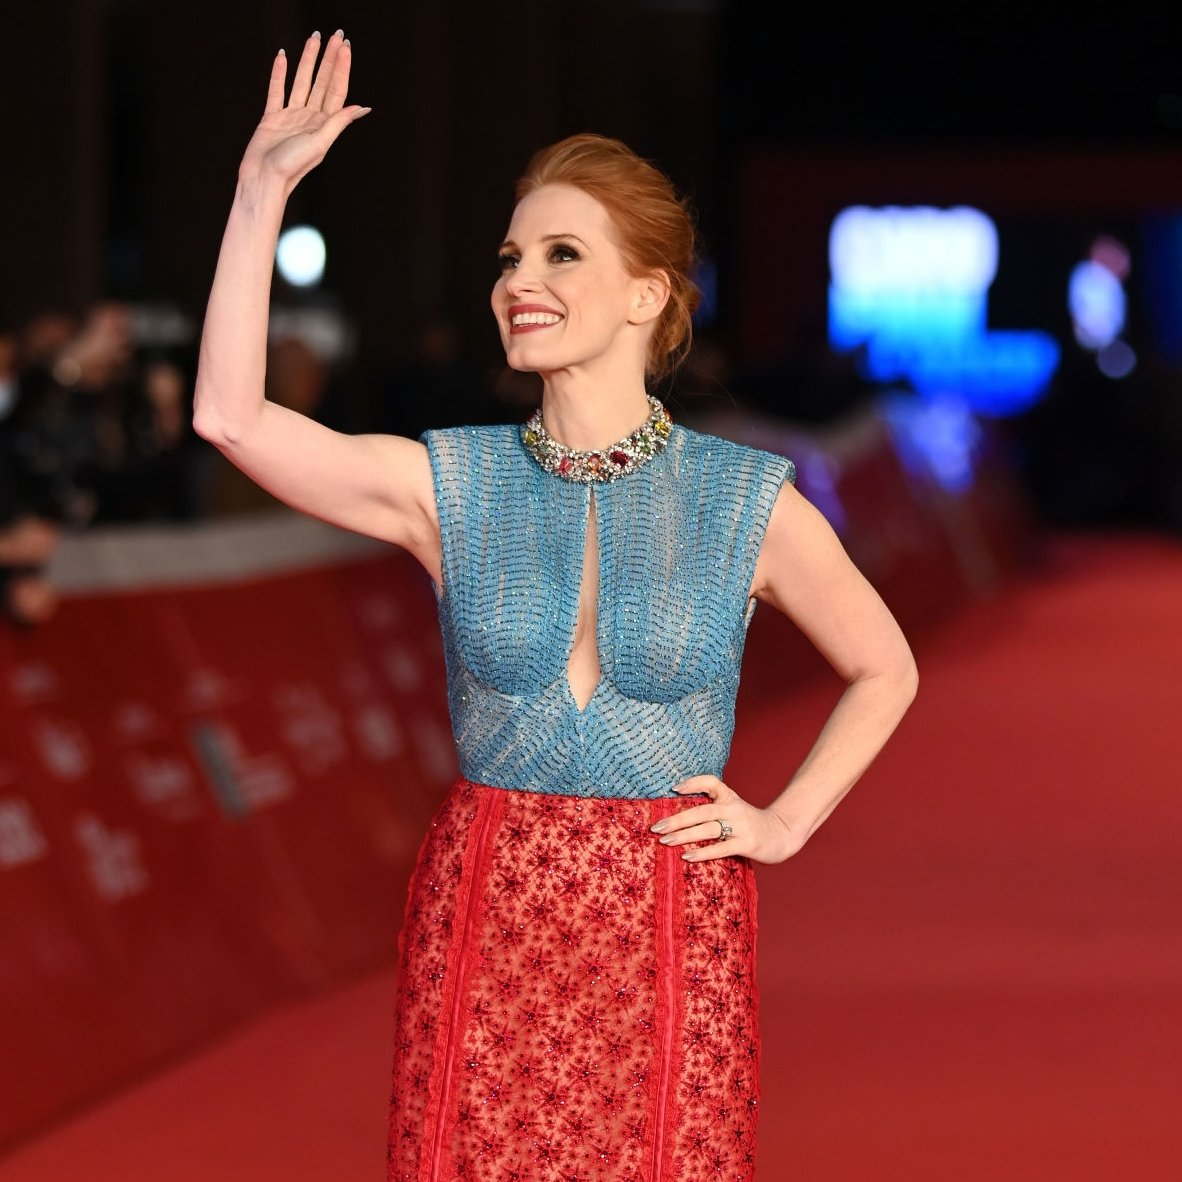 📸| Jessica Chastain during #TheEyesOfTammyFaye premiere in Rome Film Festival today.